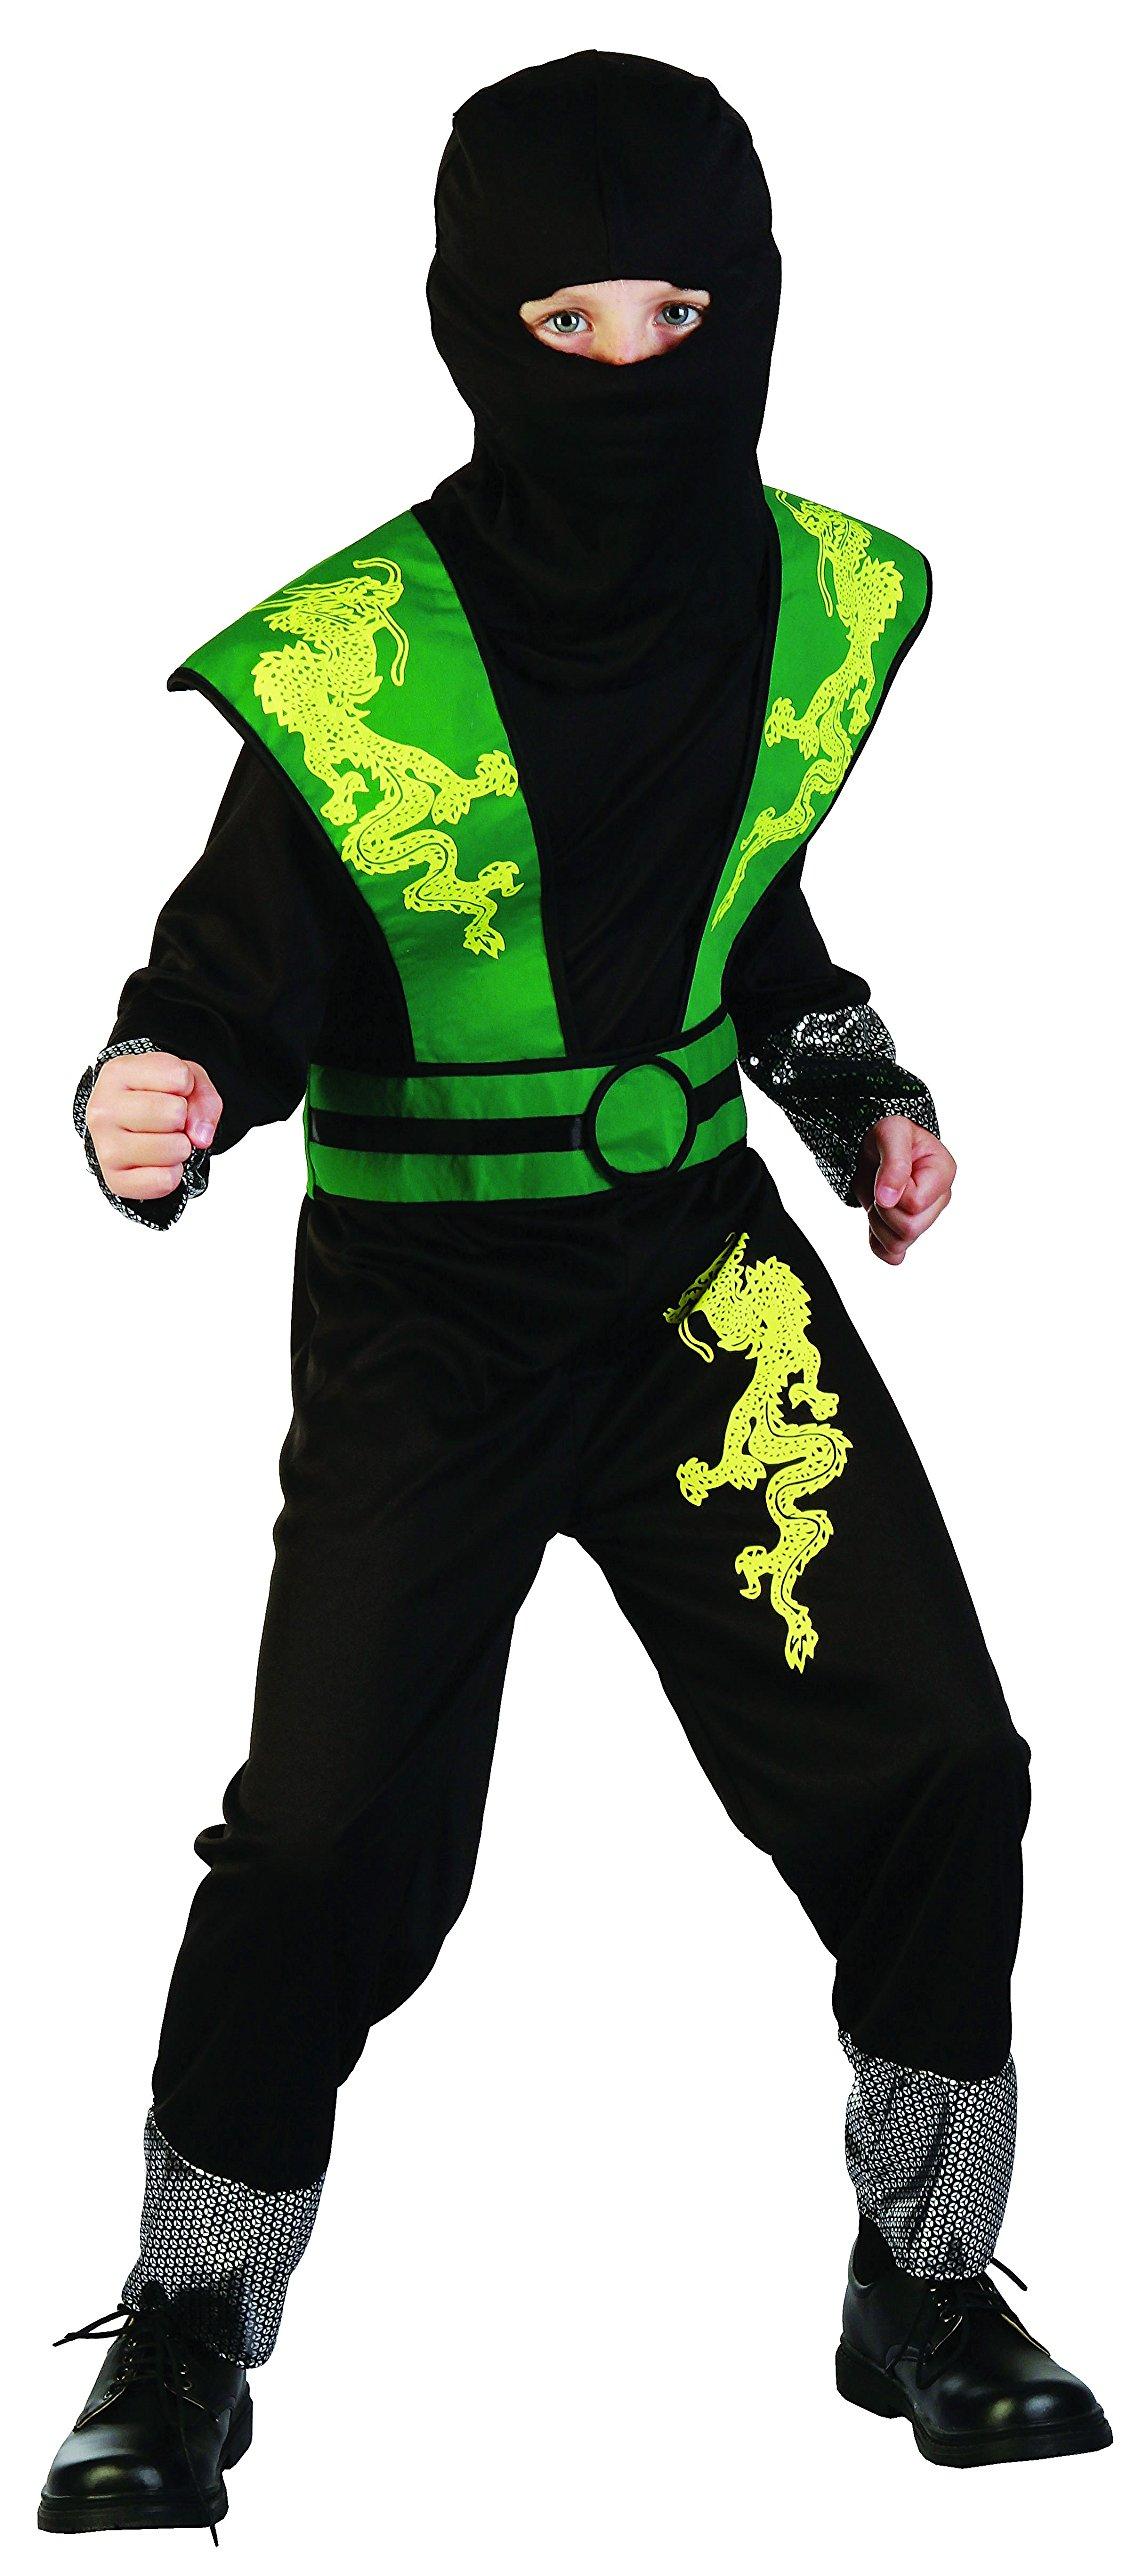 Magicoo-Dragon-Ninja-Kostm-Kinder-grn-schwarz-Halloween-Karneval-Ninja-Kostme-fr-Kinder-Jungen-134140